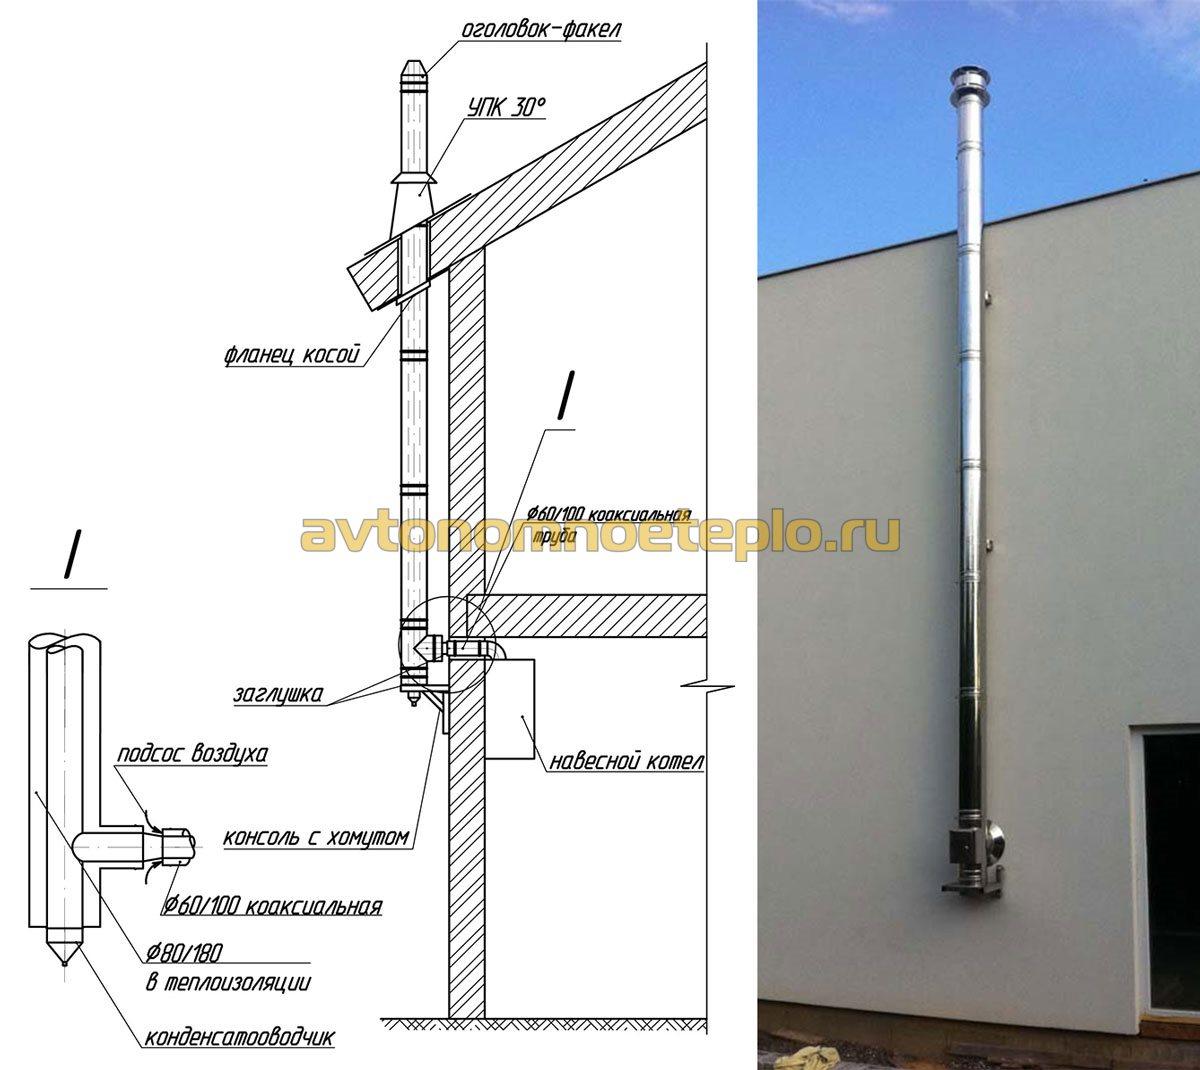 Бакси вертикальный дымоход печки для бани монтаж дымохода